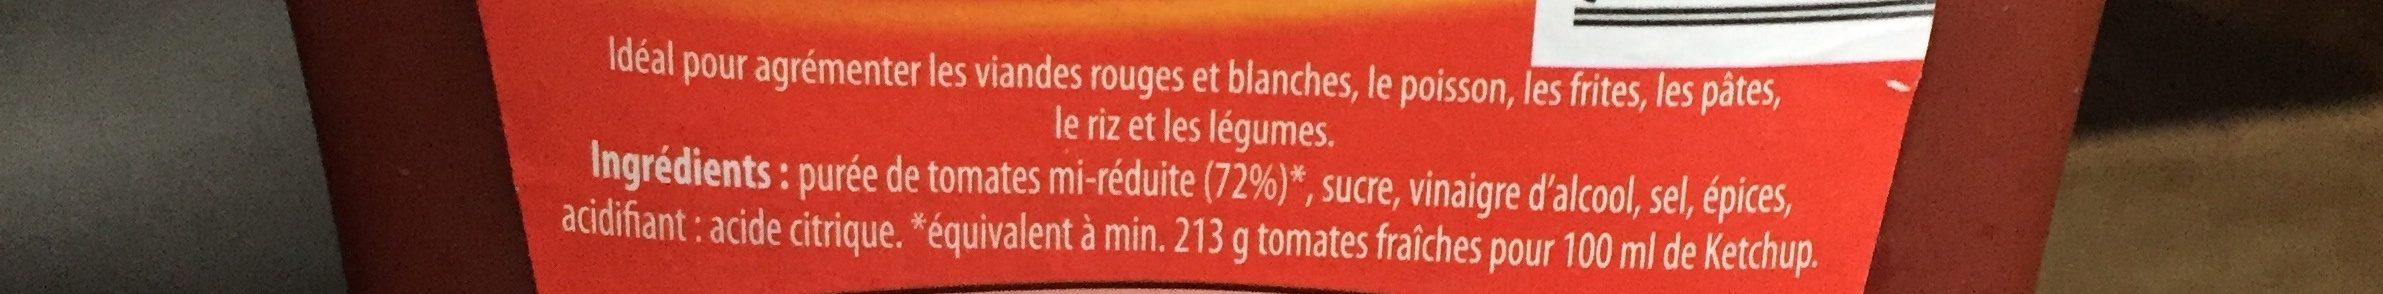 Ketchup à la tomate - Ingredients - fr